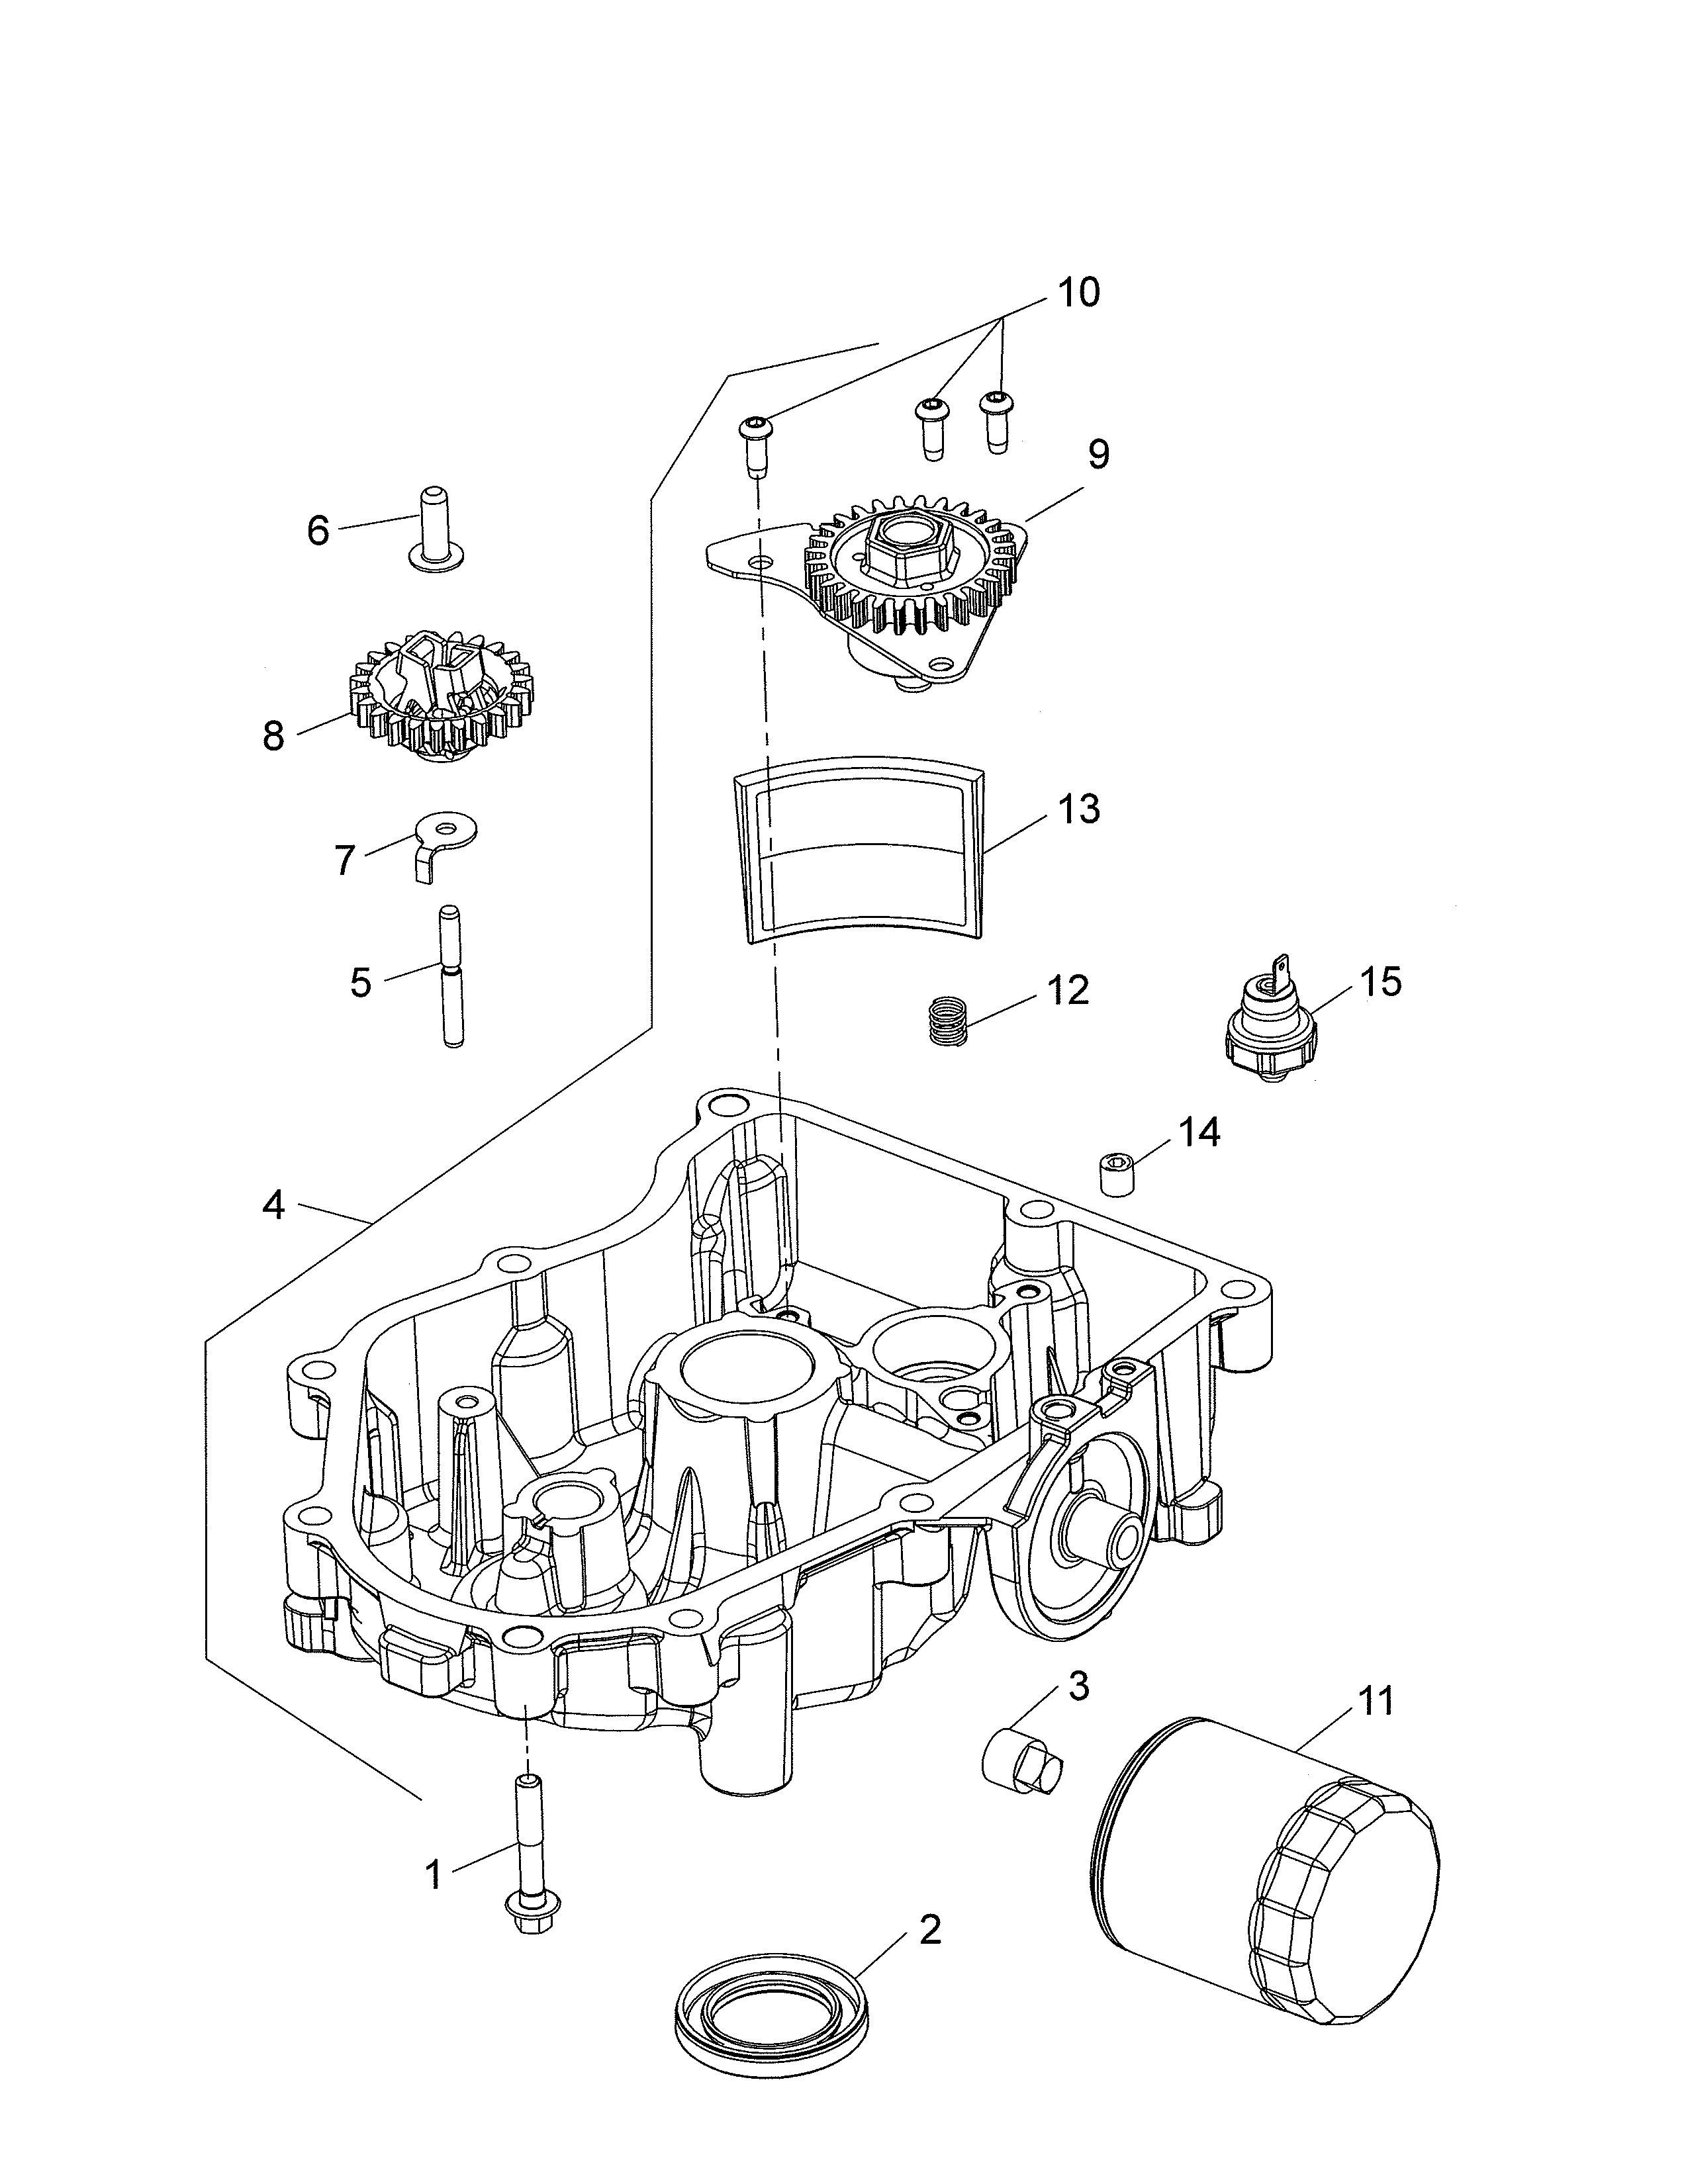 Honda Civic Engine Parts Diagram Engine Parts Diagram with Dimensions Kohler Engine Parts Model Kt725 Of Honda Civic Engine Parts Diagram